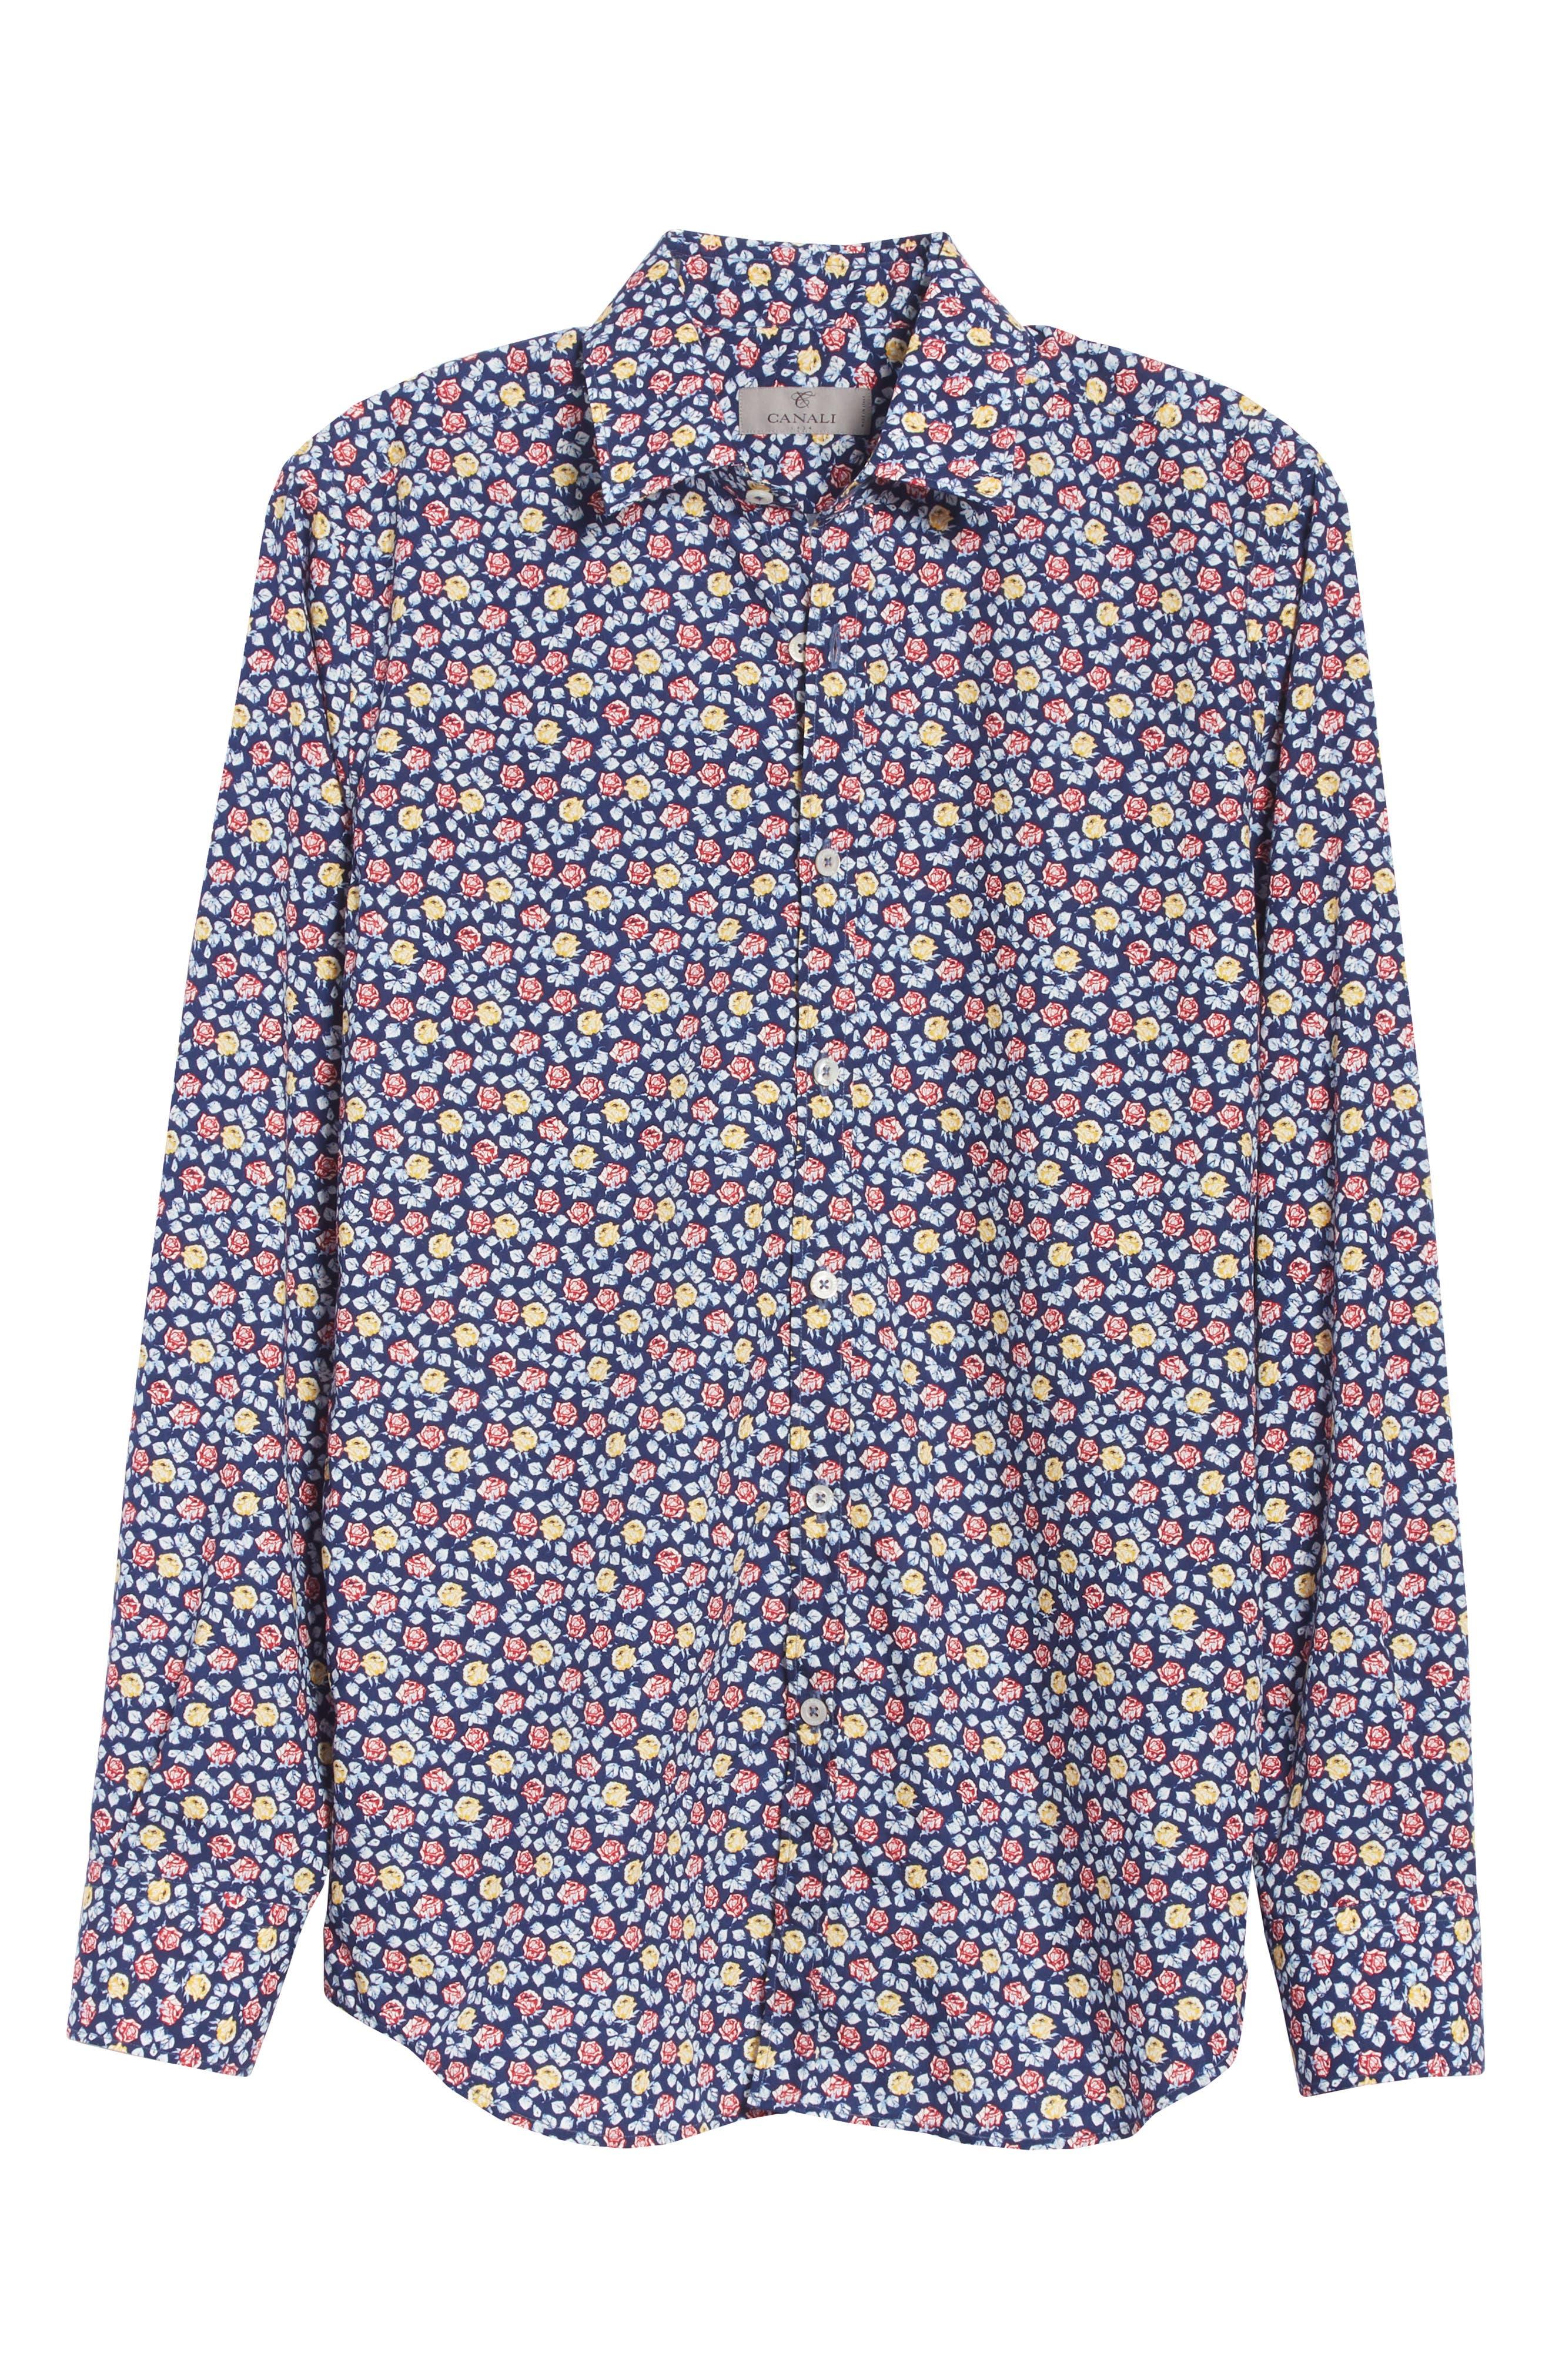 Regular Fit Floral Sport Shirt,                             Alternate thumbnail 6, color,                             Blue